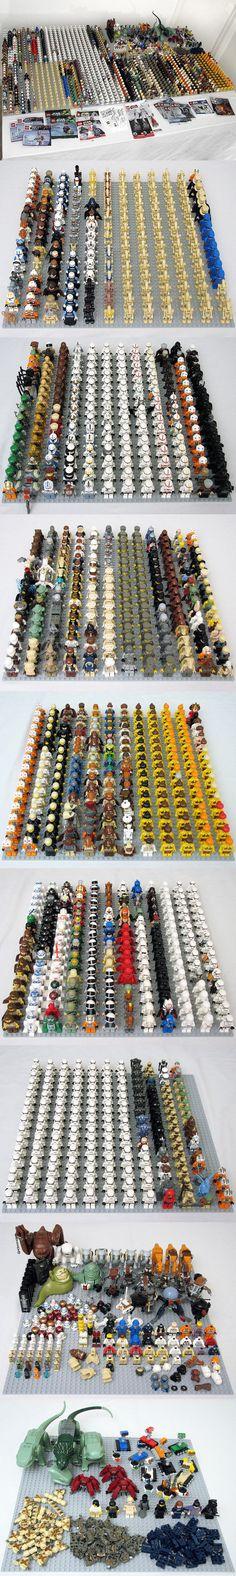 HUGE Star Wars minifigure (1220) collection! #StarWars #LEGO #minifigure